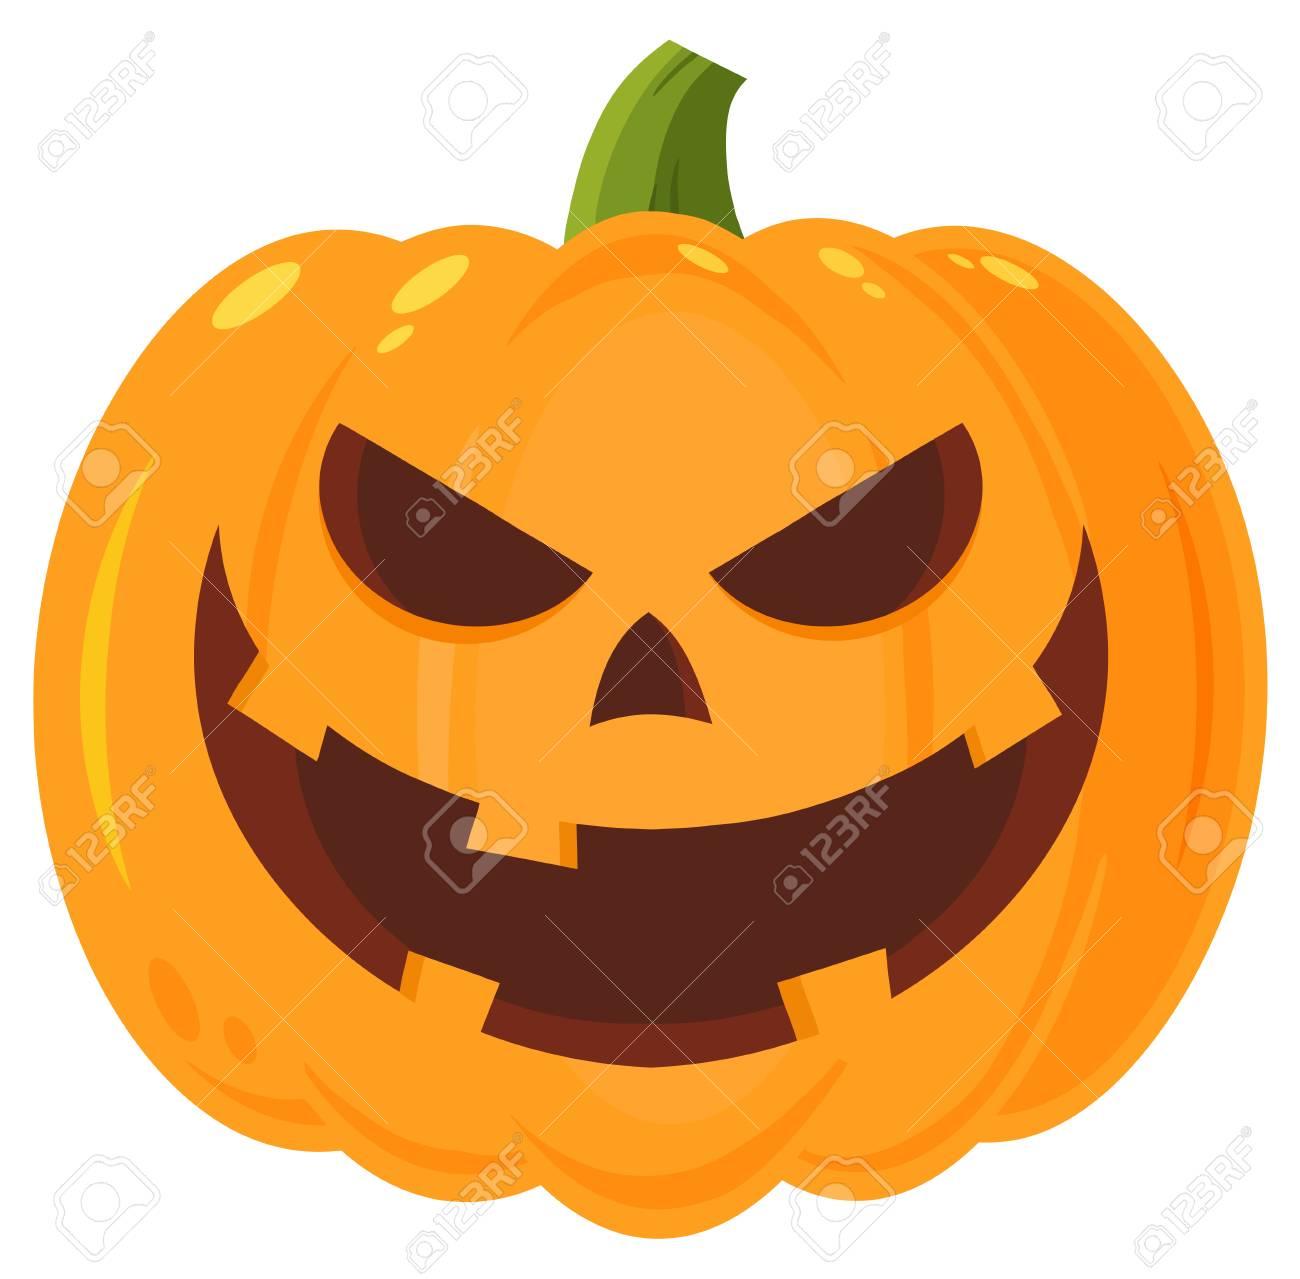 Halloween Pumpkin Cartoon Images.Stock Illustration